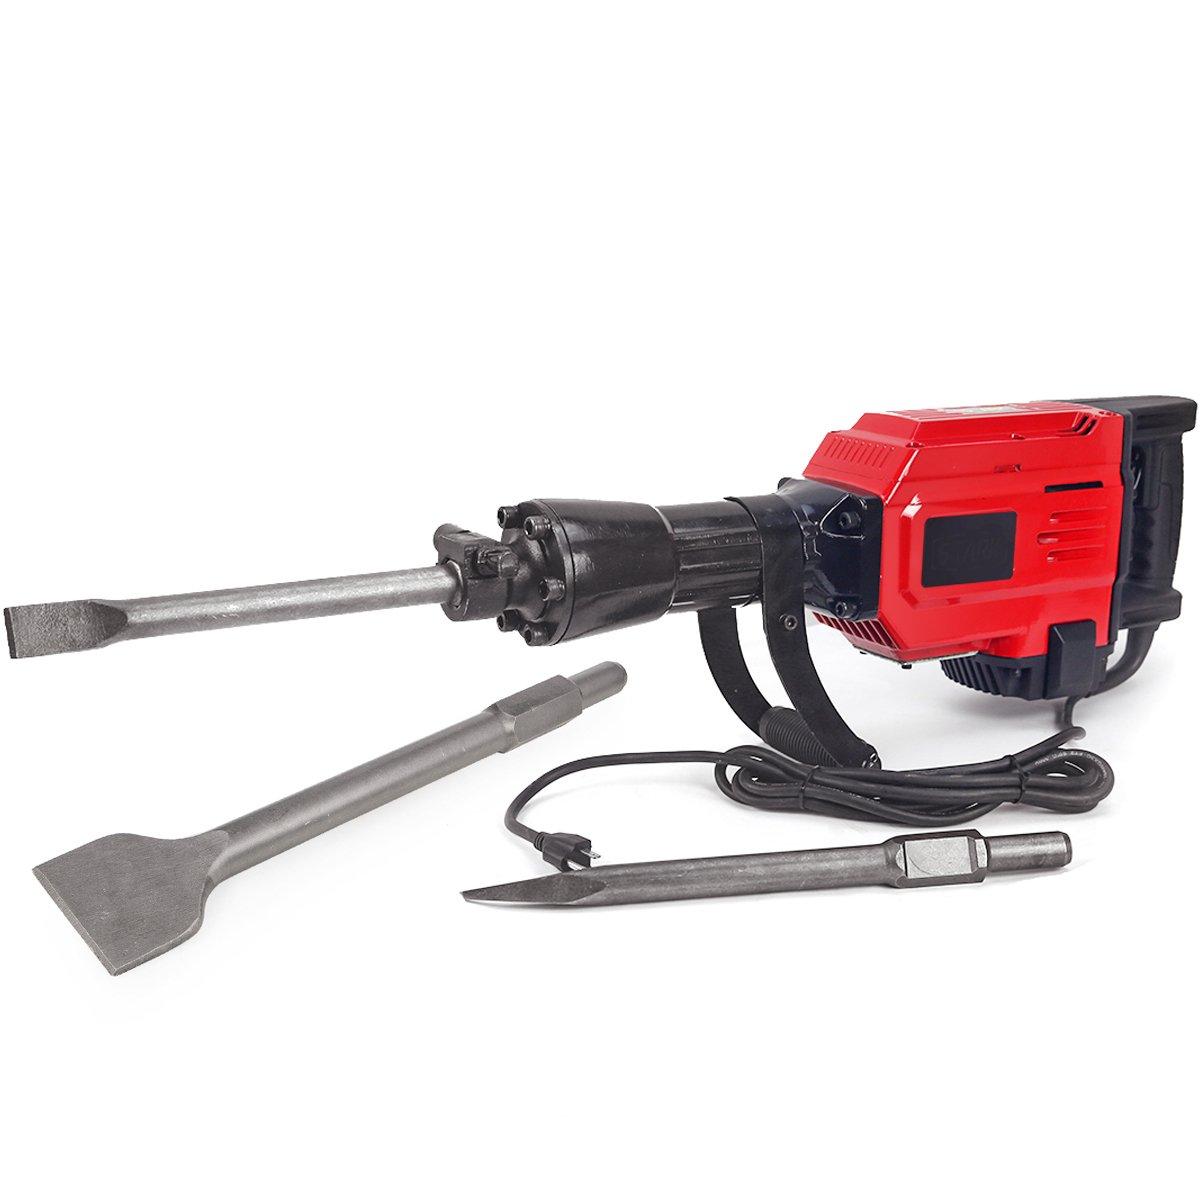 XtremepowerUS Heavy Duty Electric Demolition Jack hammer, Concrete Breaker (2200Watt w/ Scraping Chisel)